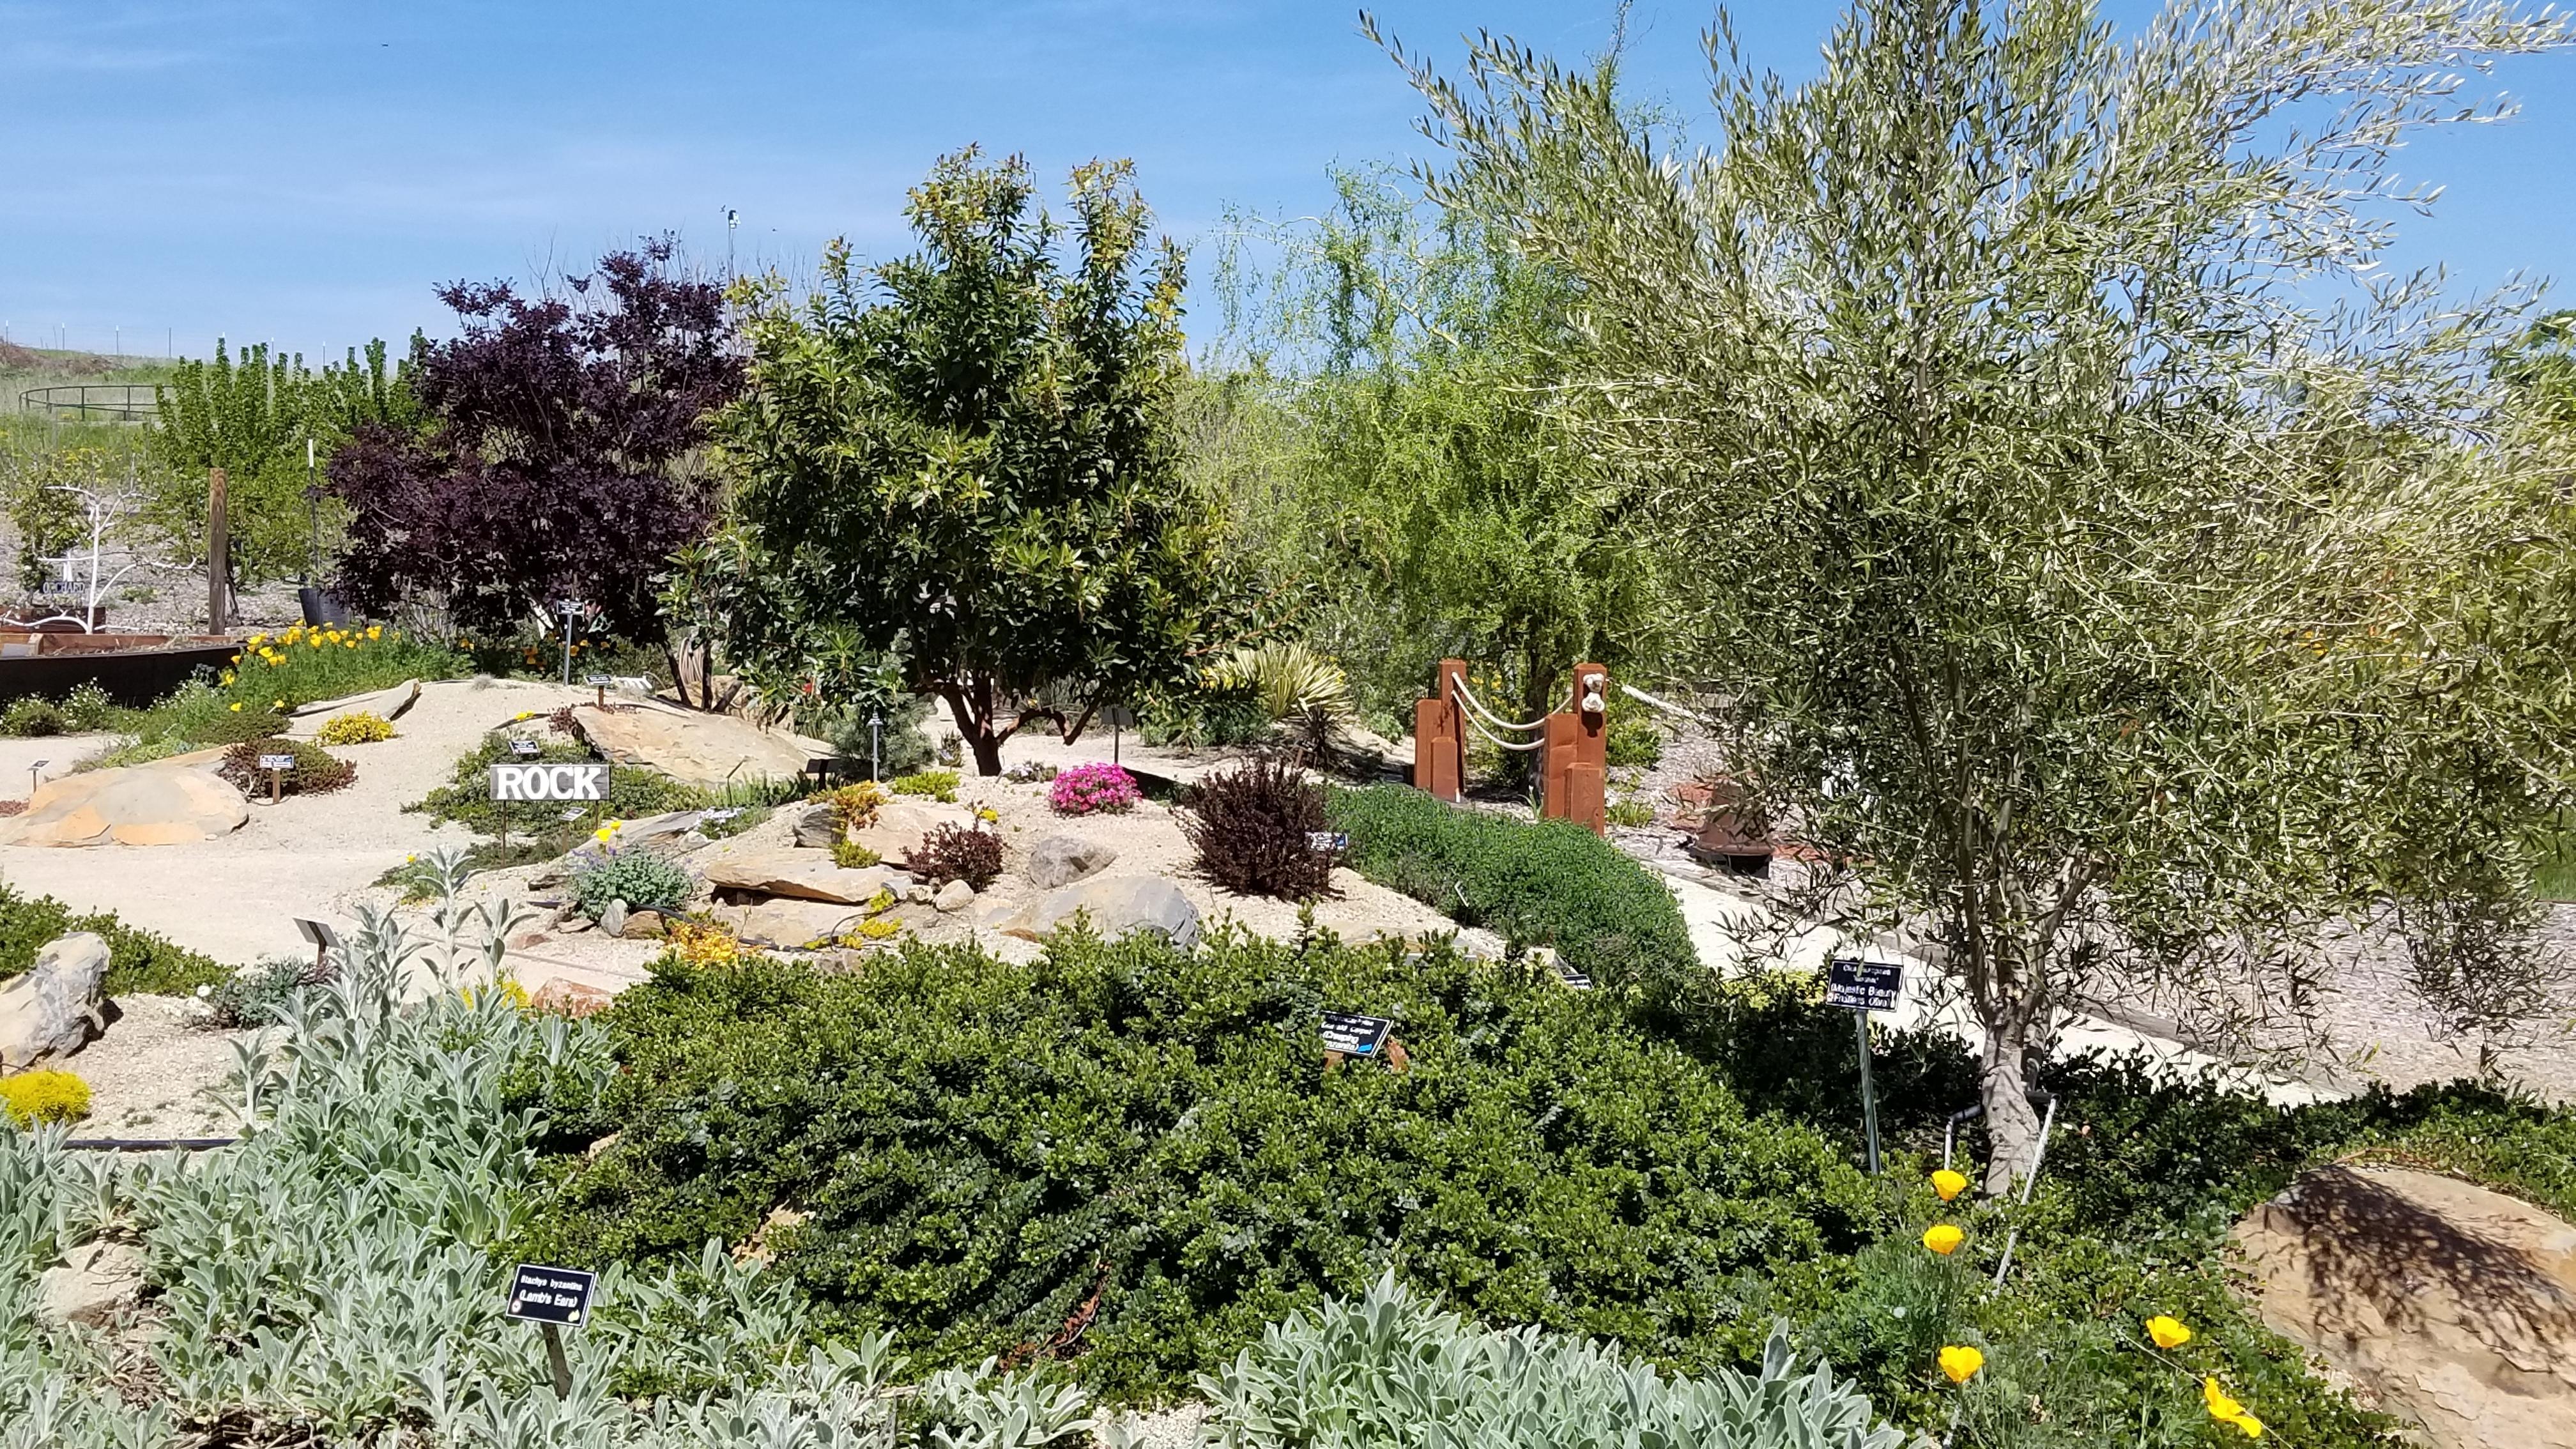 Rock Garden_20180424_142457